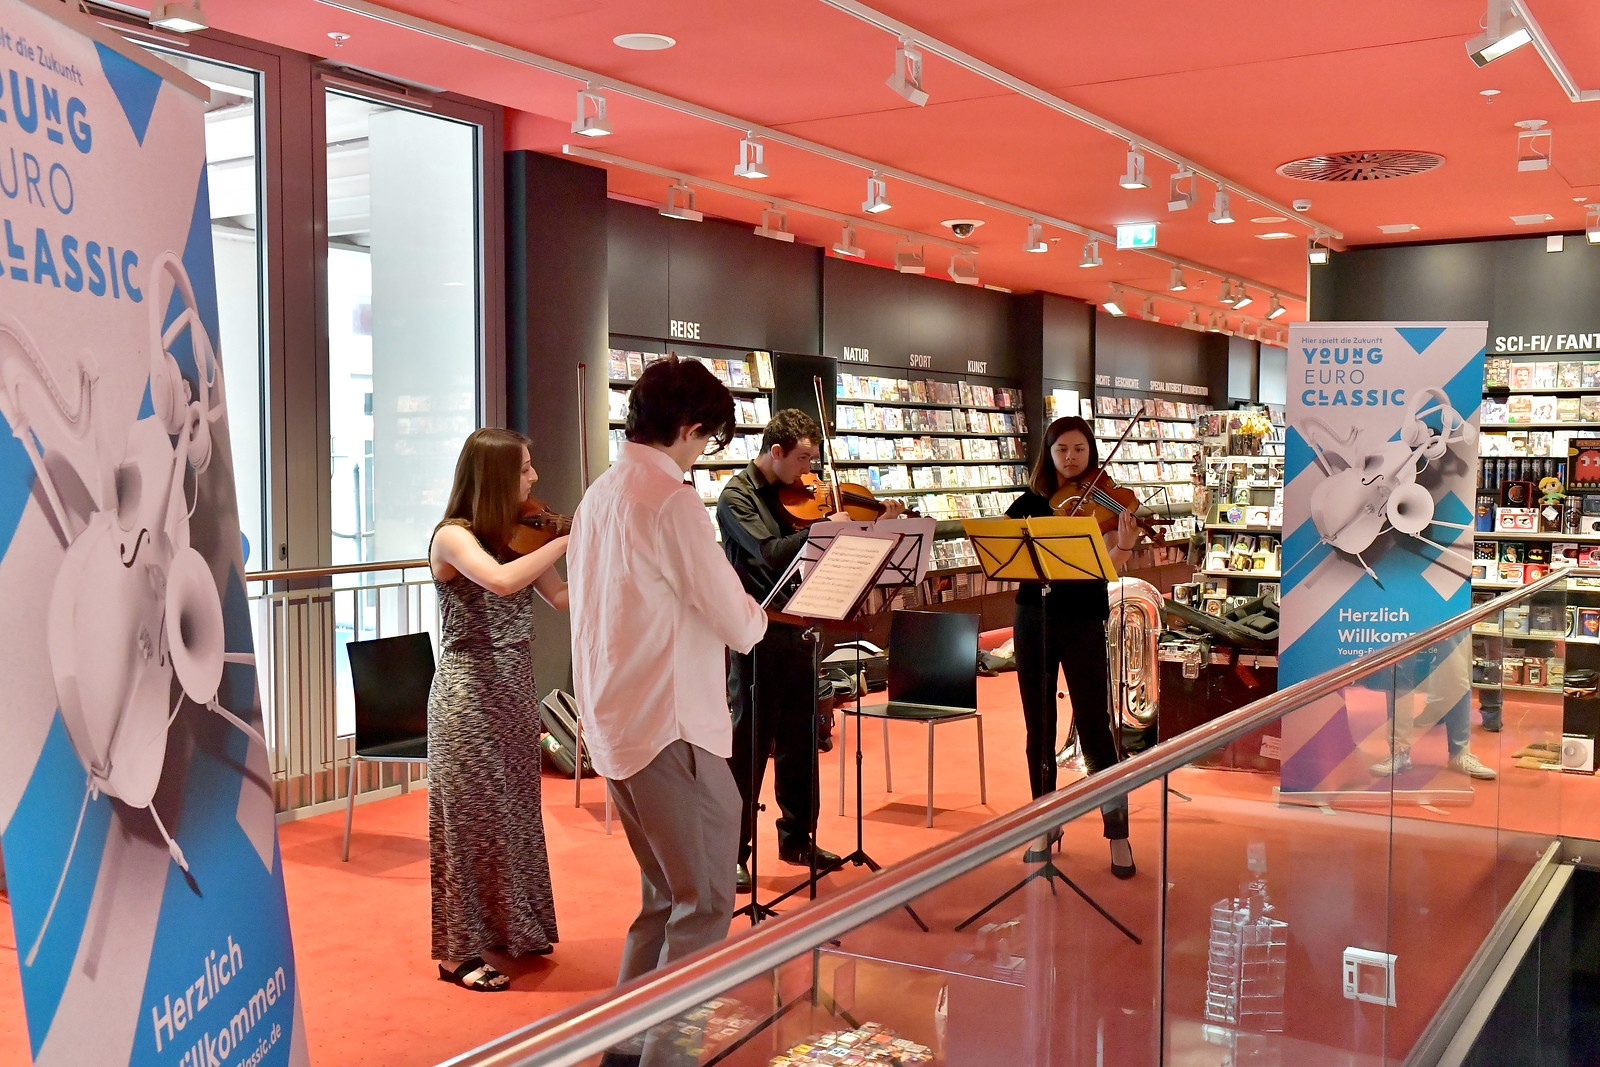 FY18 BPYO Tour - BPYO String Quartet Berlin (credit - Paul Marotta)